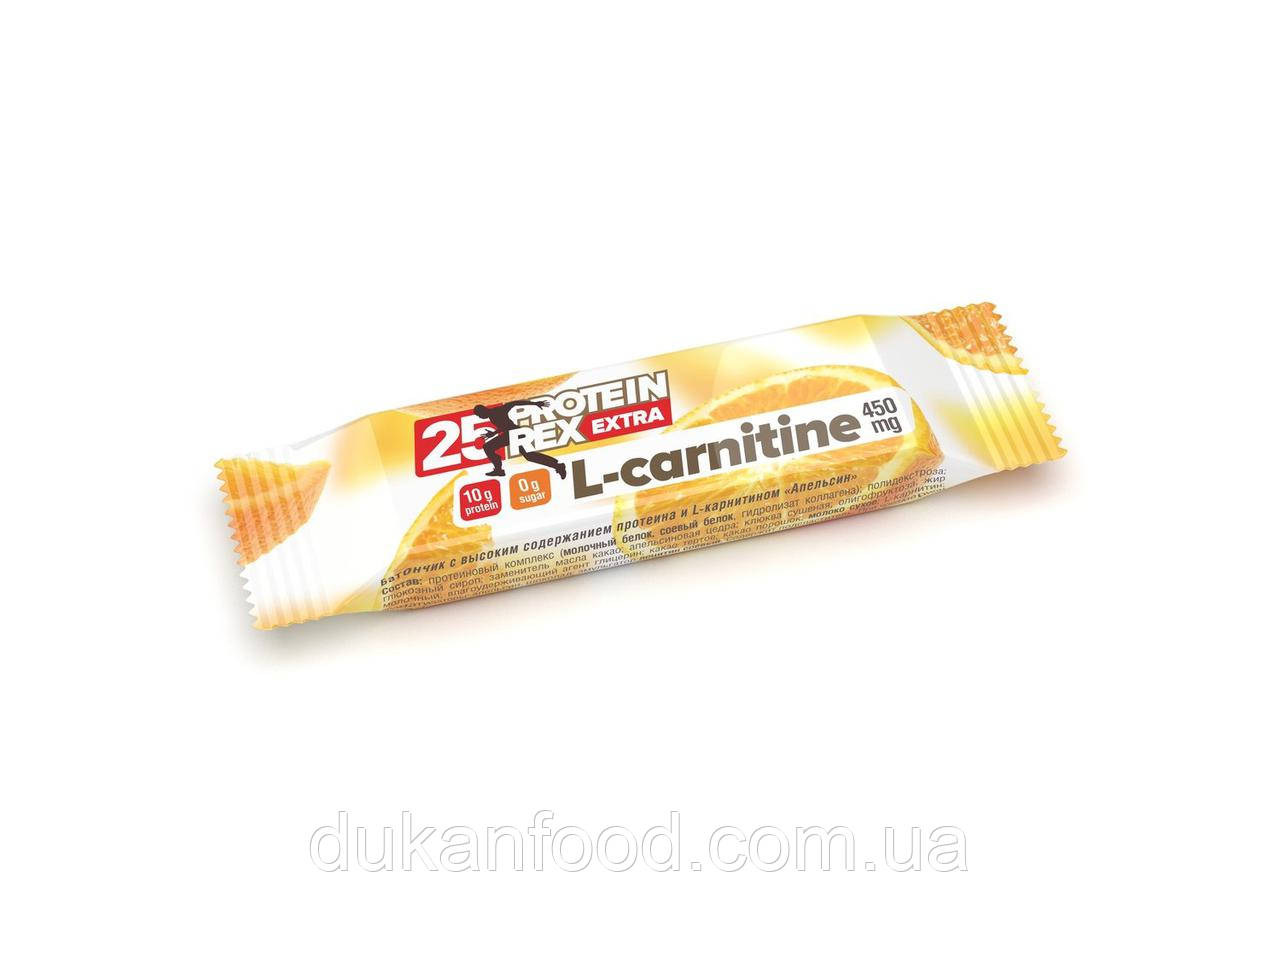 "Батончик протеиновый ProteinRex с L-карнитином ""Апельсин"", 25% протеина"